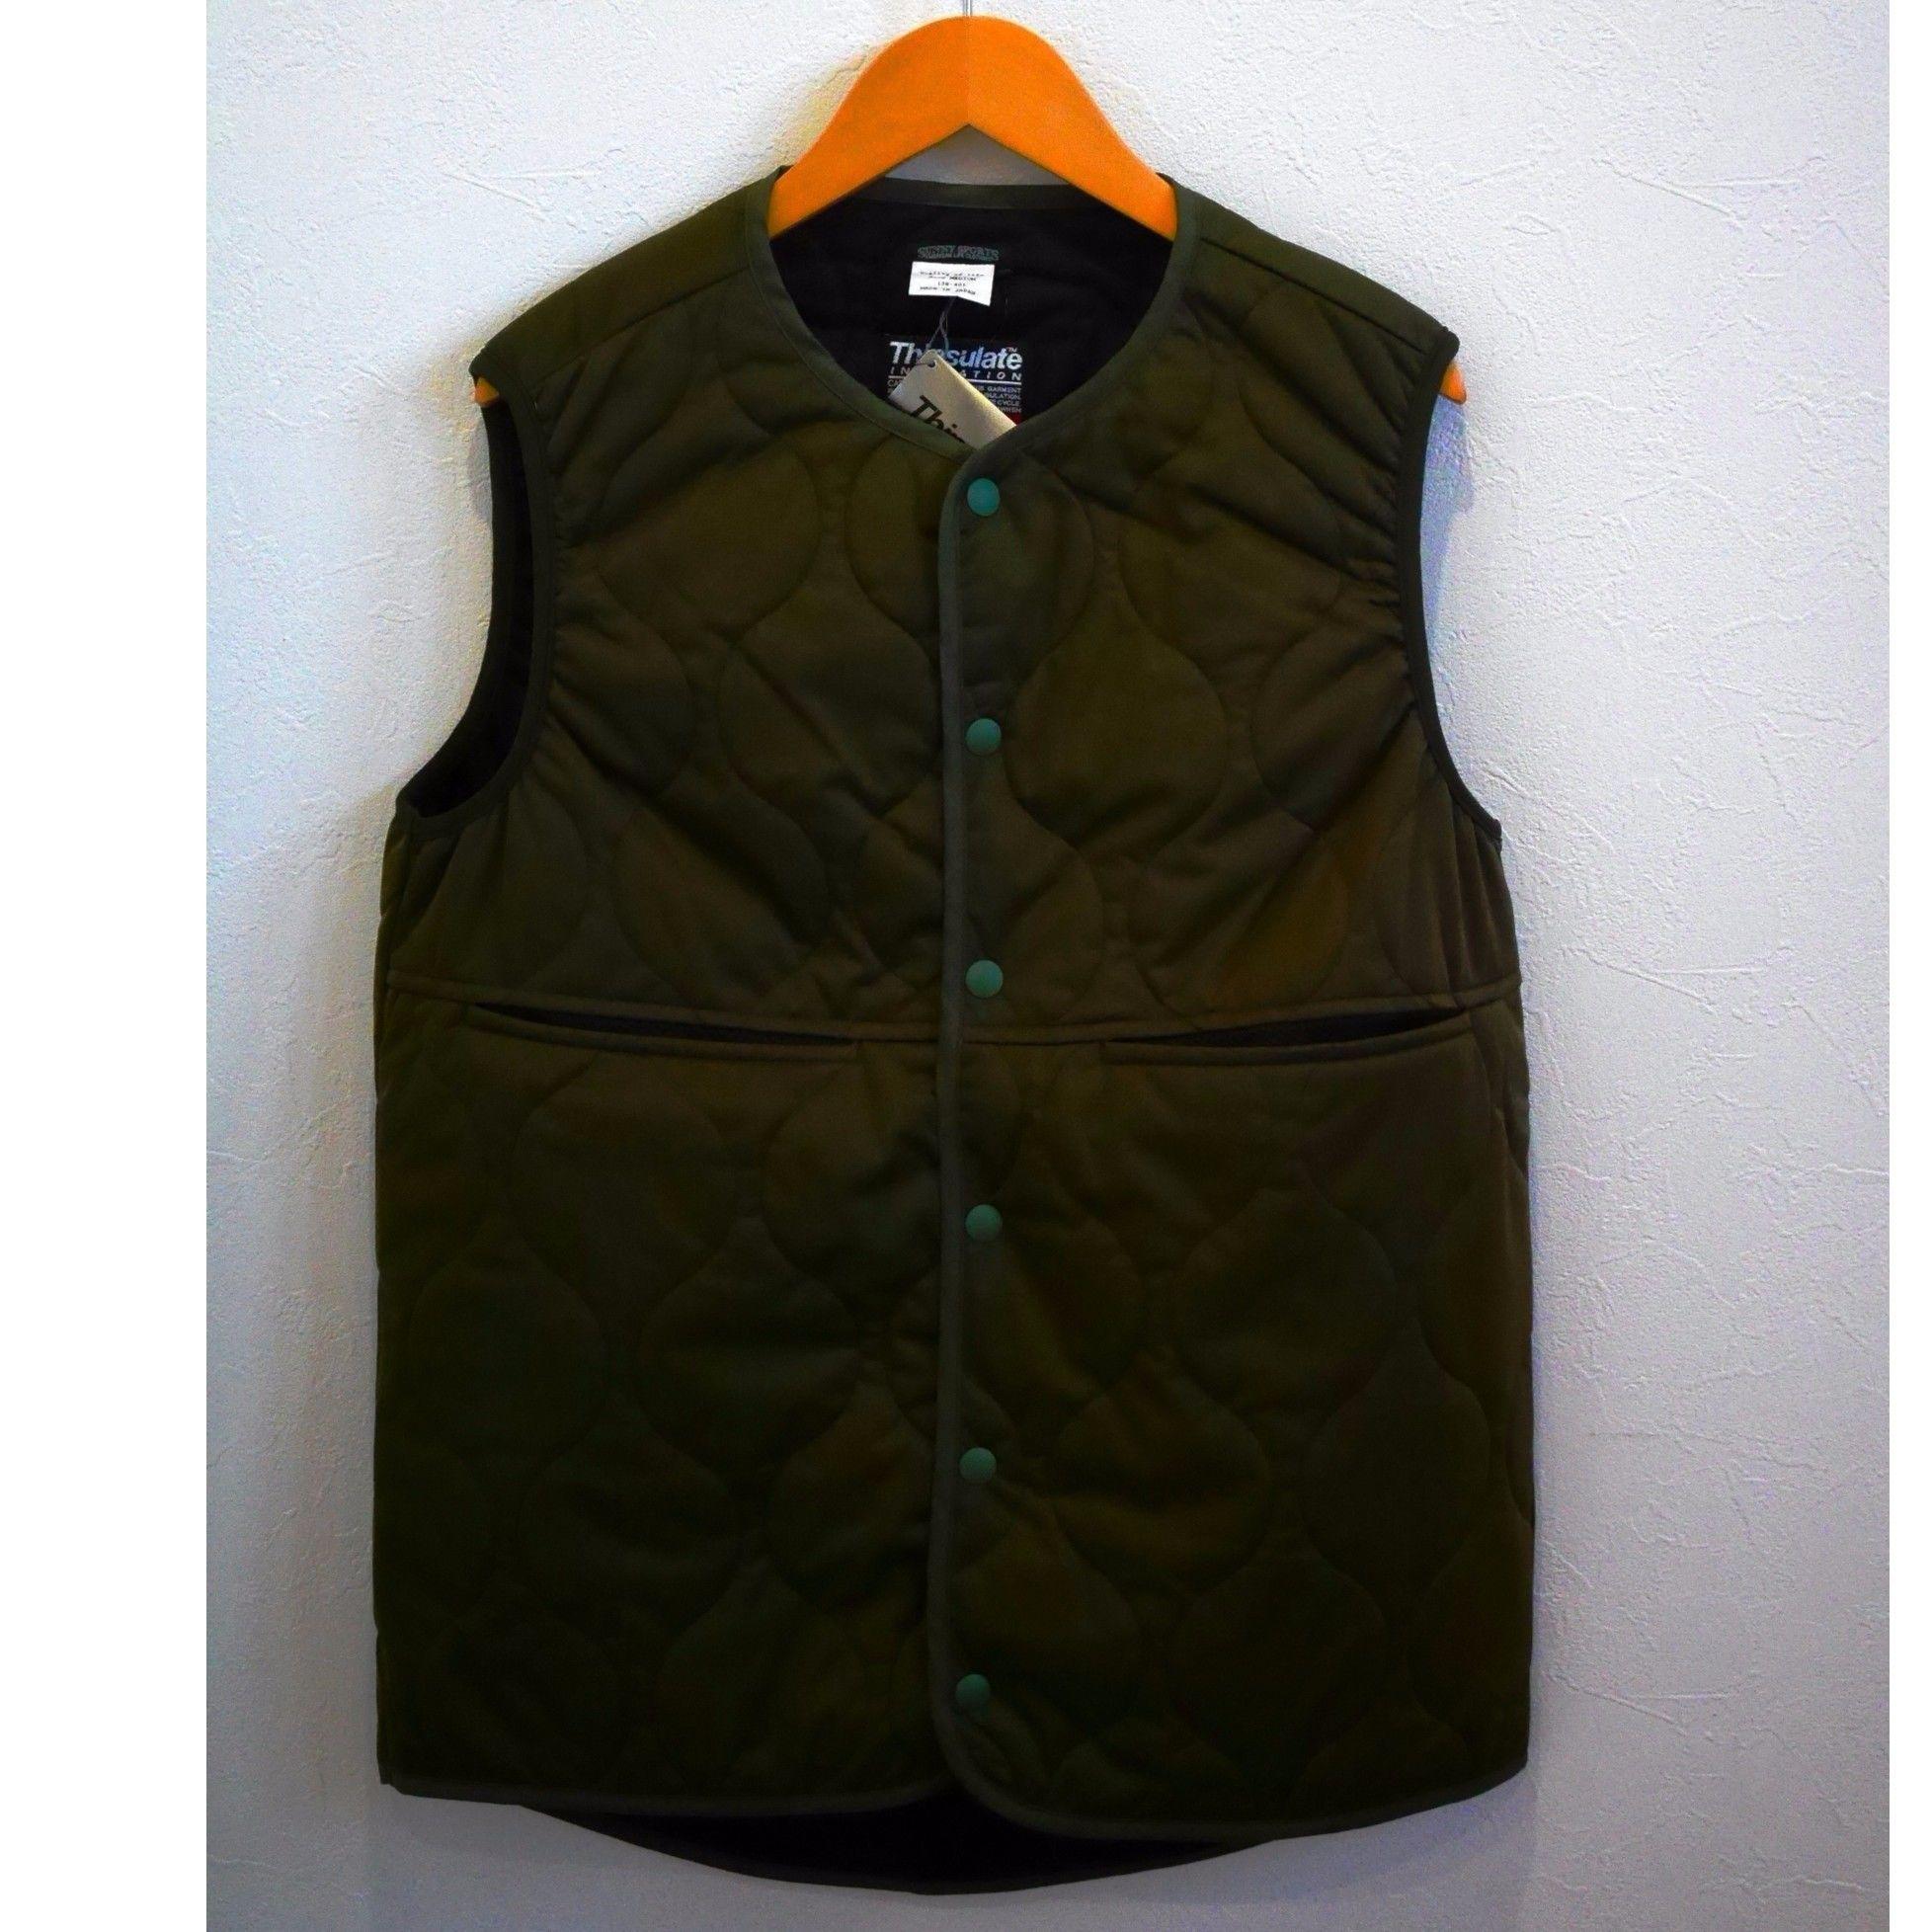 SUNNY SPORTS[サニースポーツ]/soft shell vest